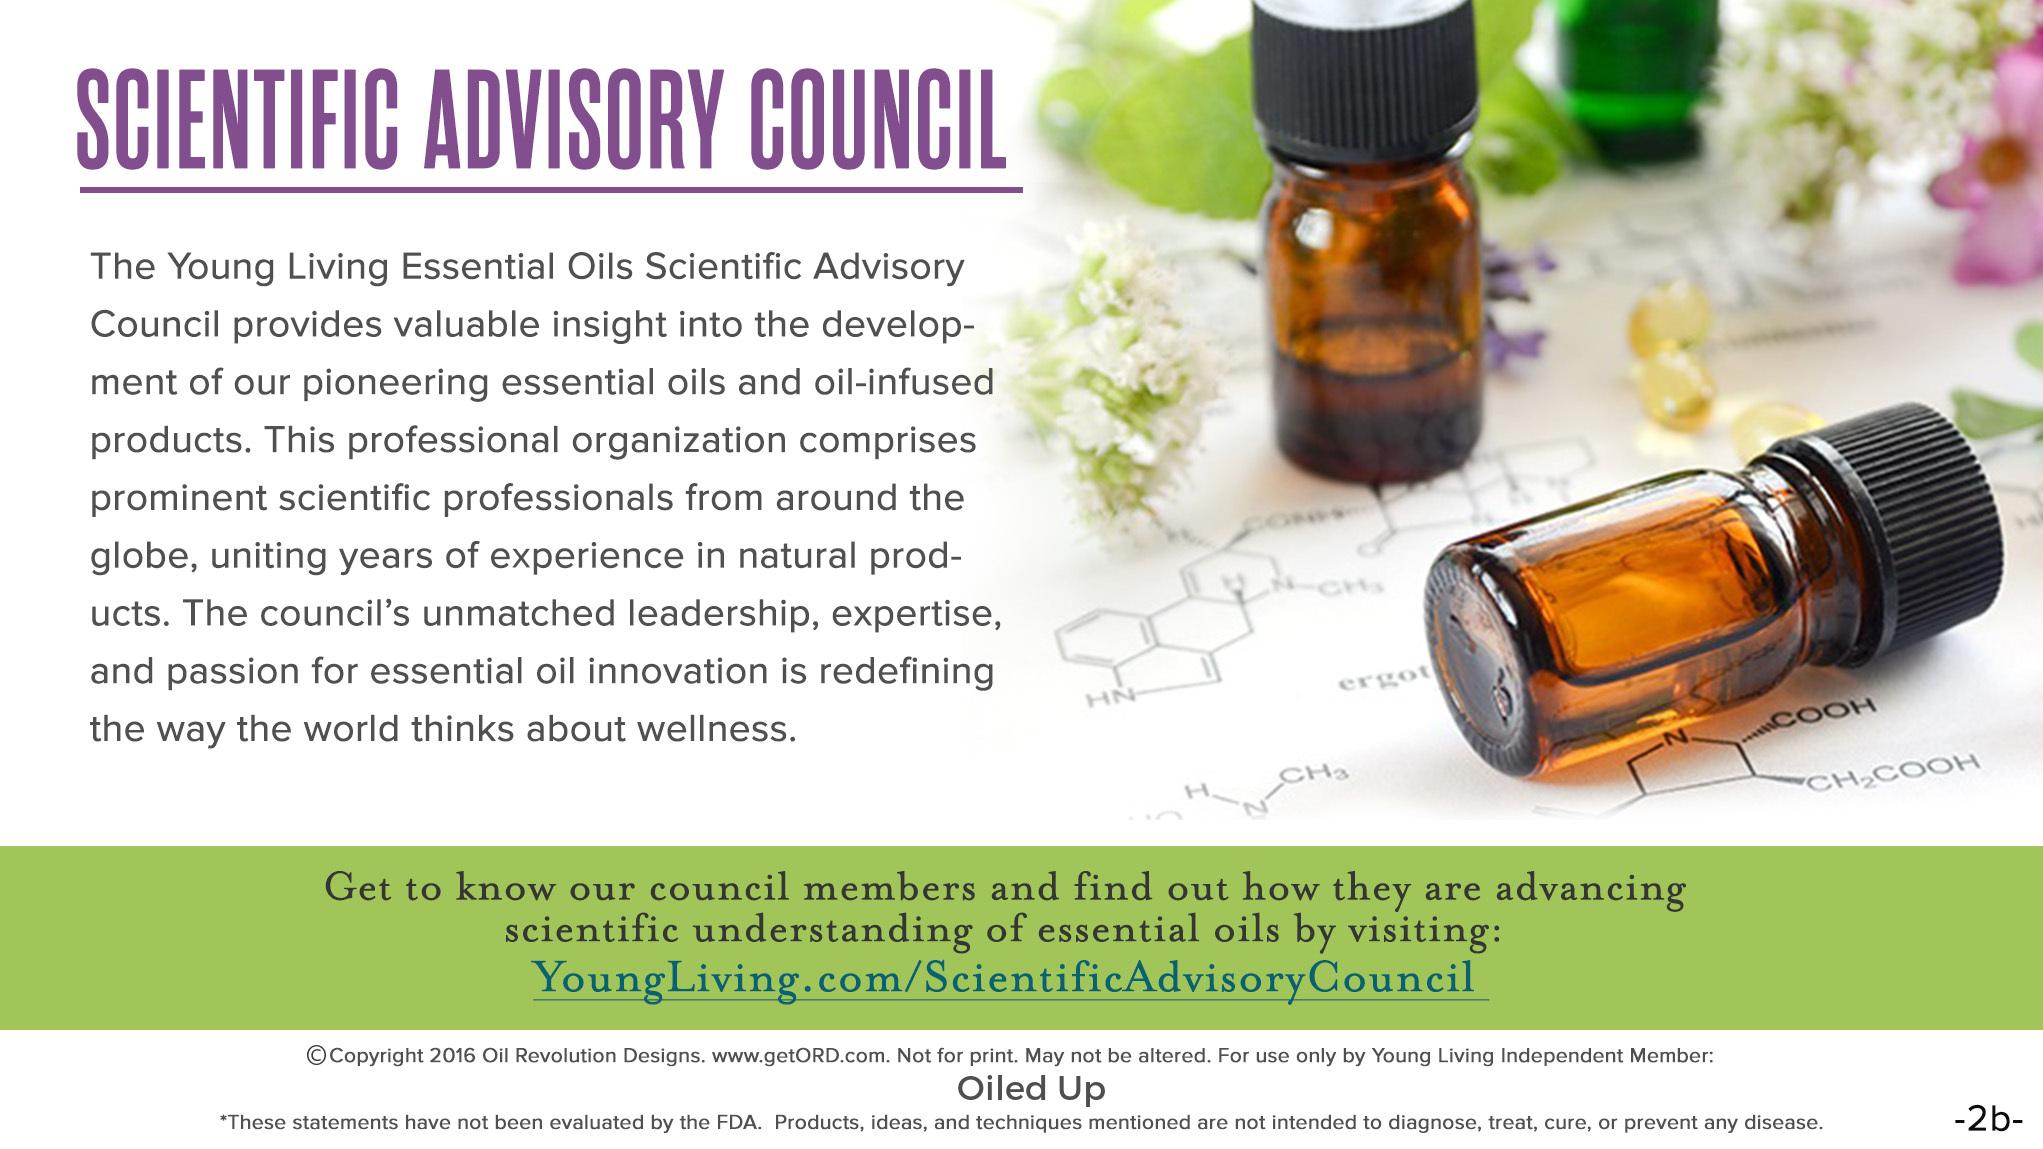 2b-Scientific-Advisory-Council.jpg